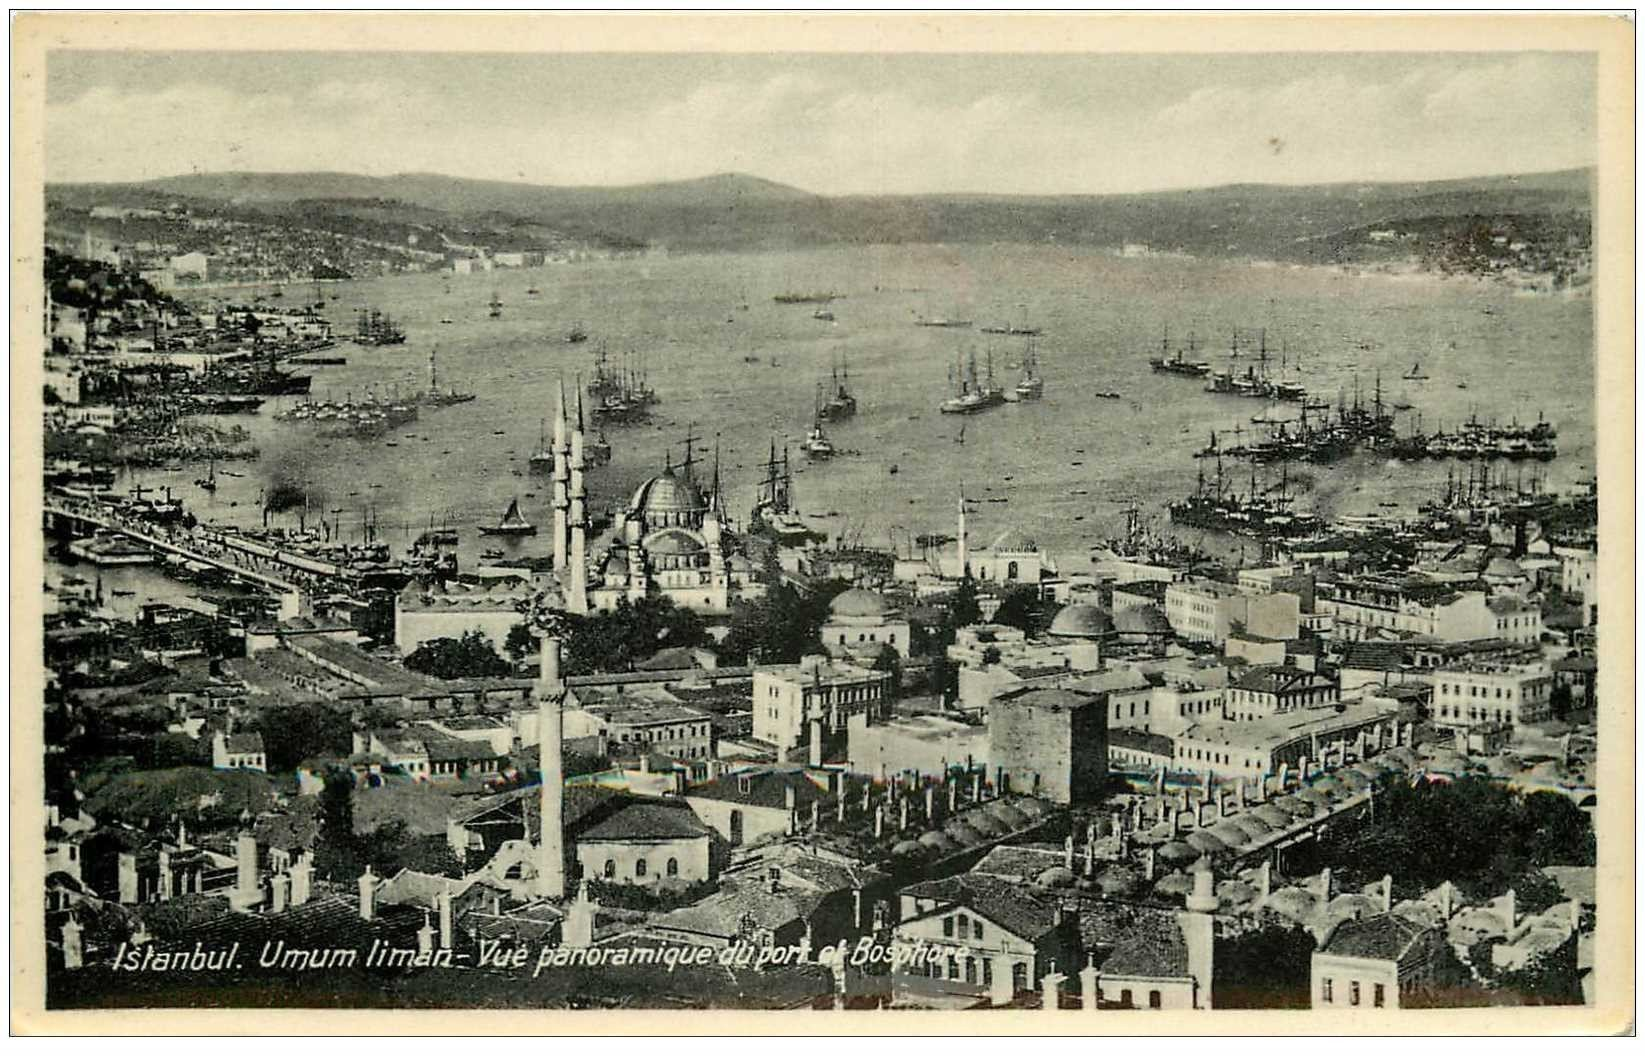 carte postale ancienne TURQUIE. Istambul. Port de Bosphore 1936 Umum liman